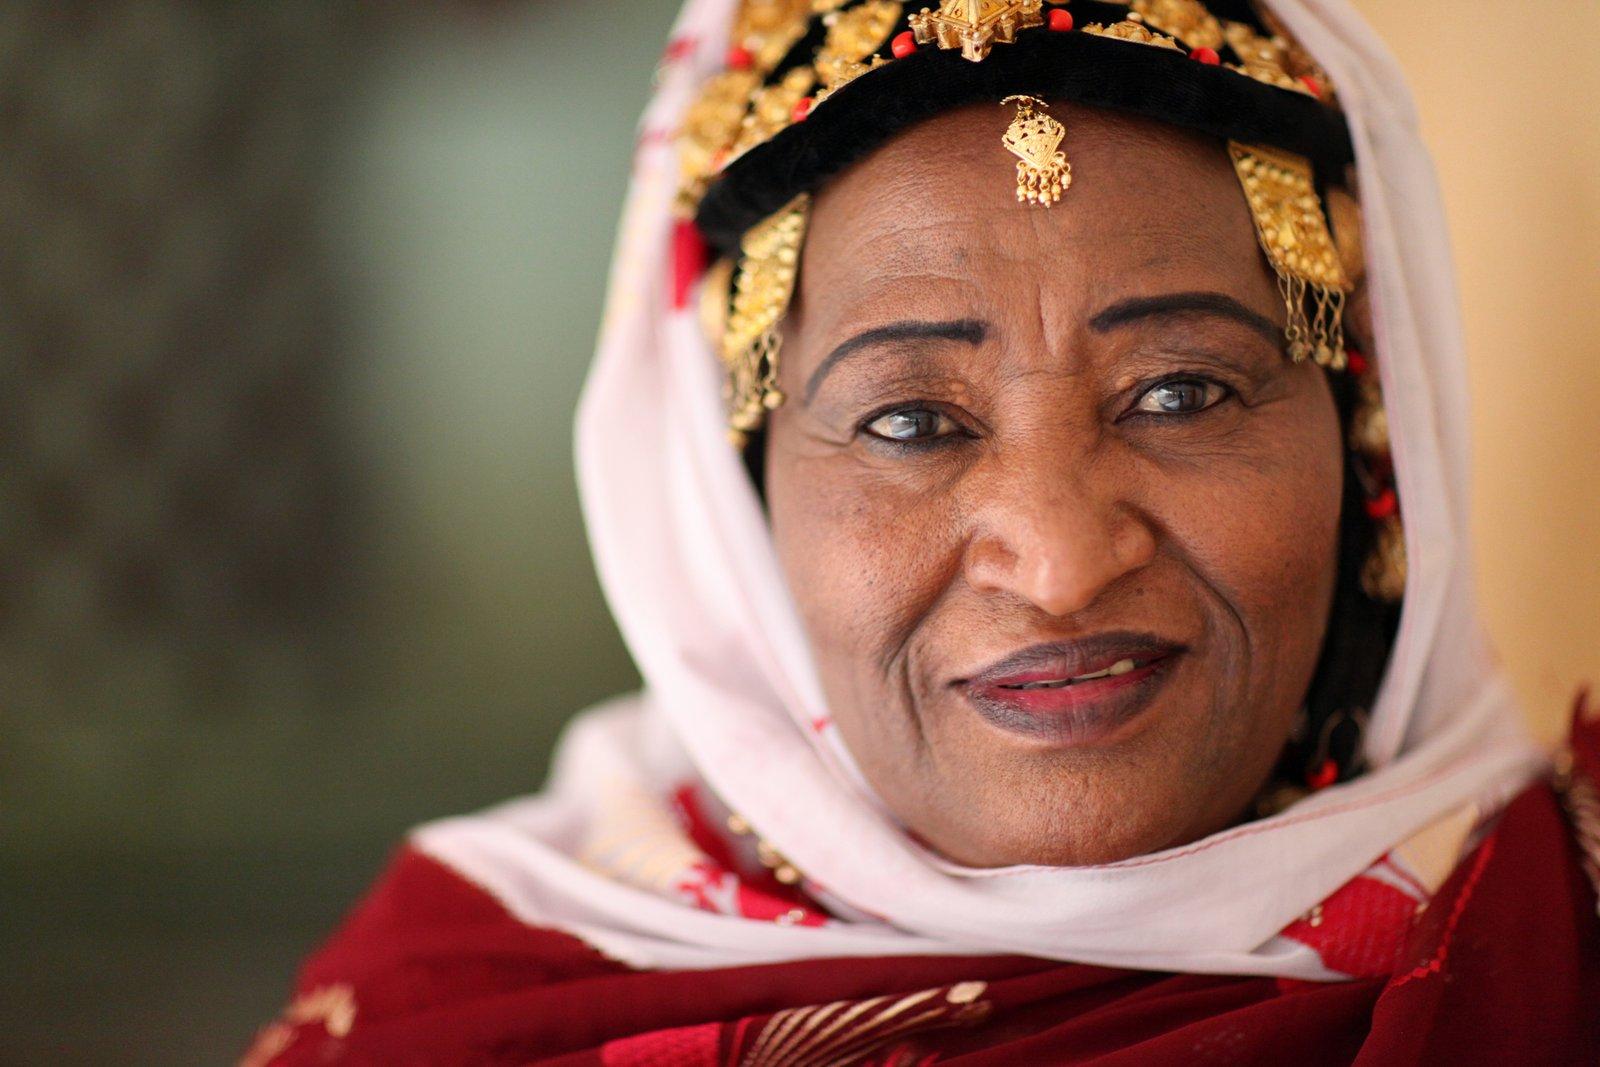 Malian singer Khaira Arby